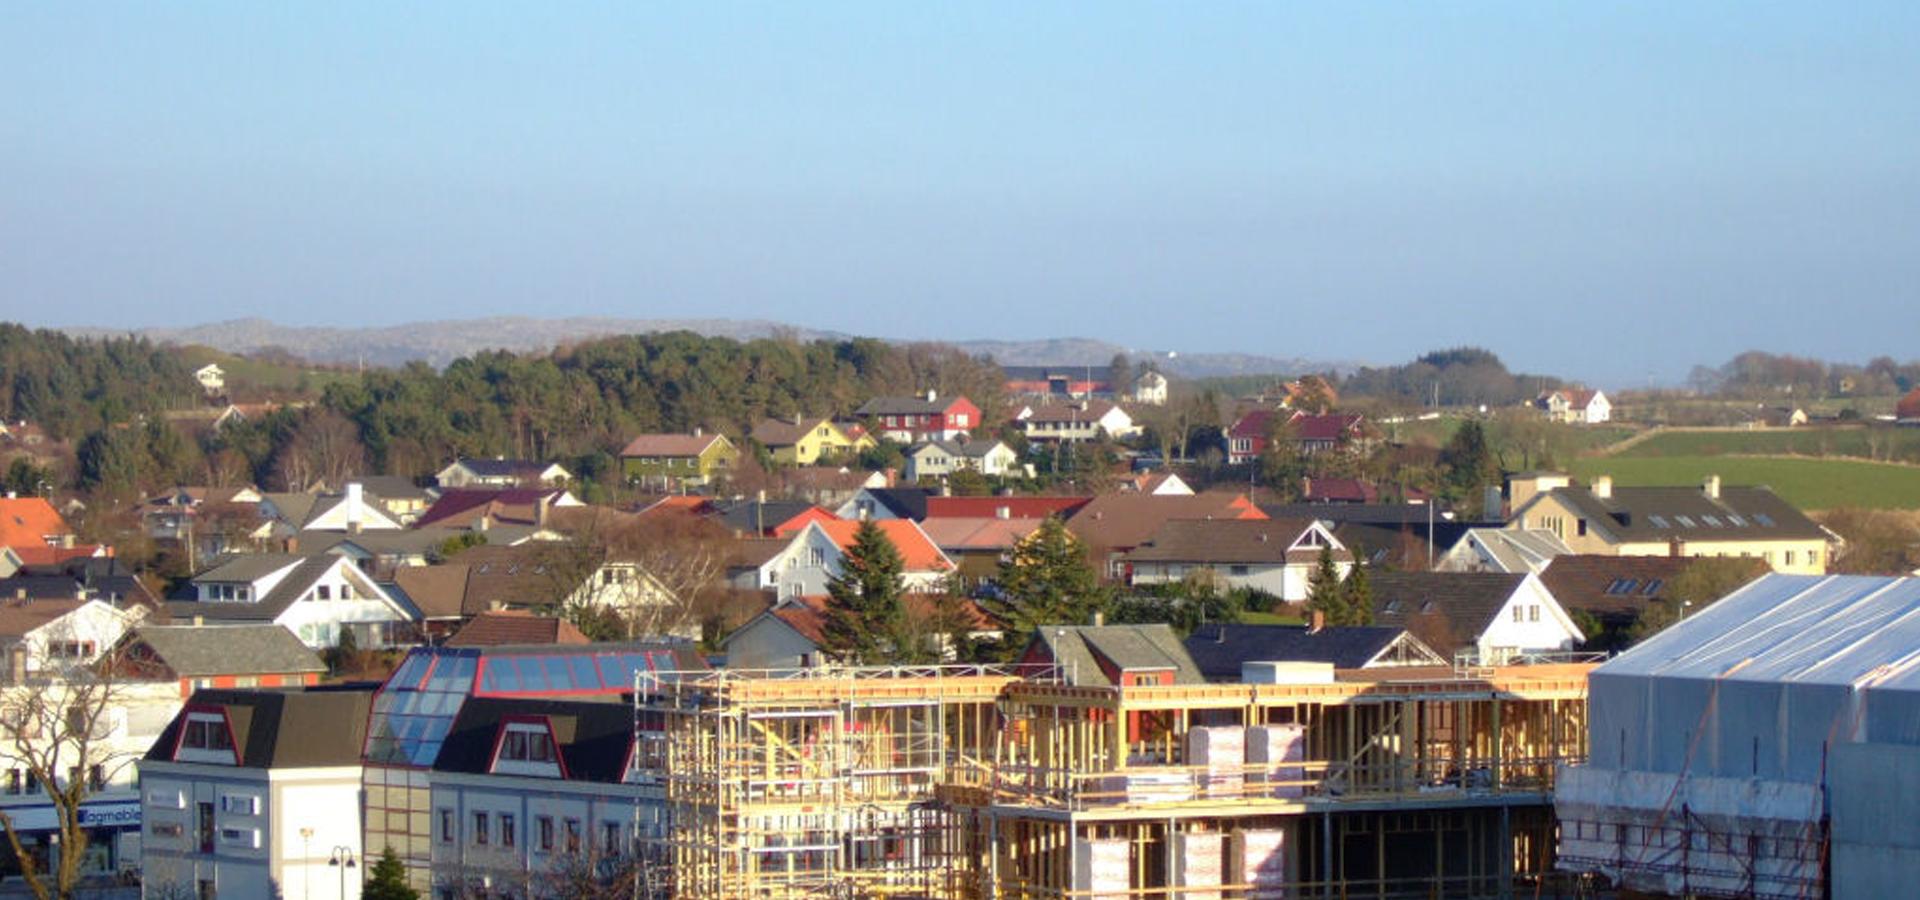 Peer-to-peer advisory in Kleppe, Rogaland County, Norway